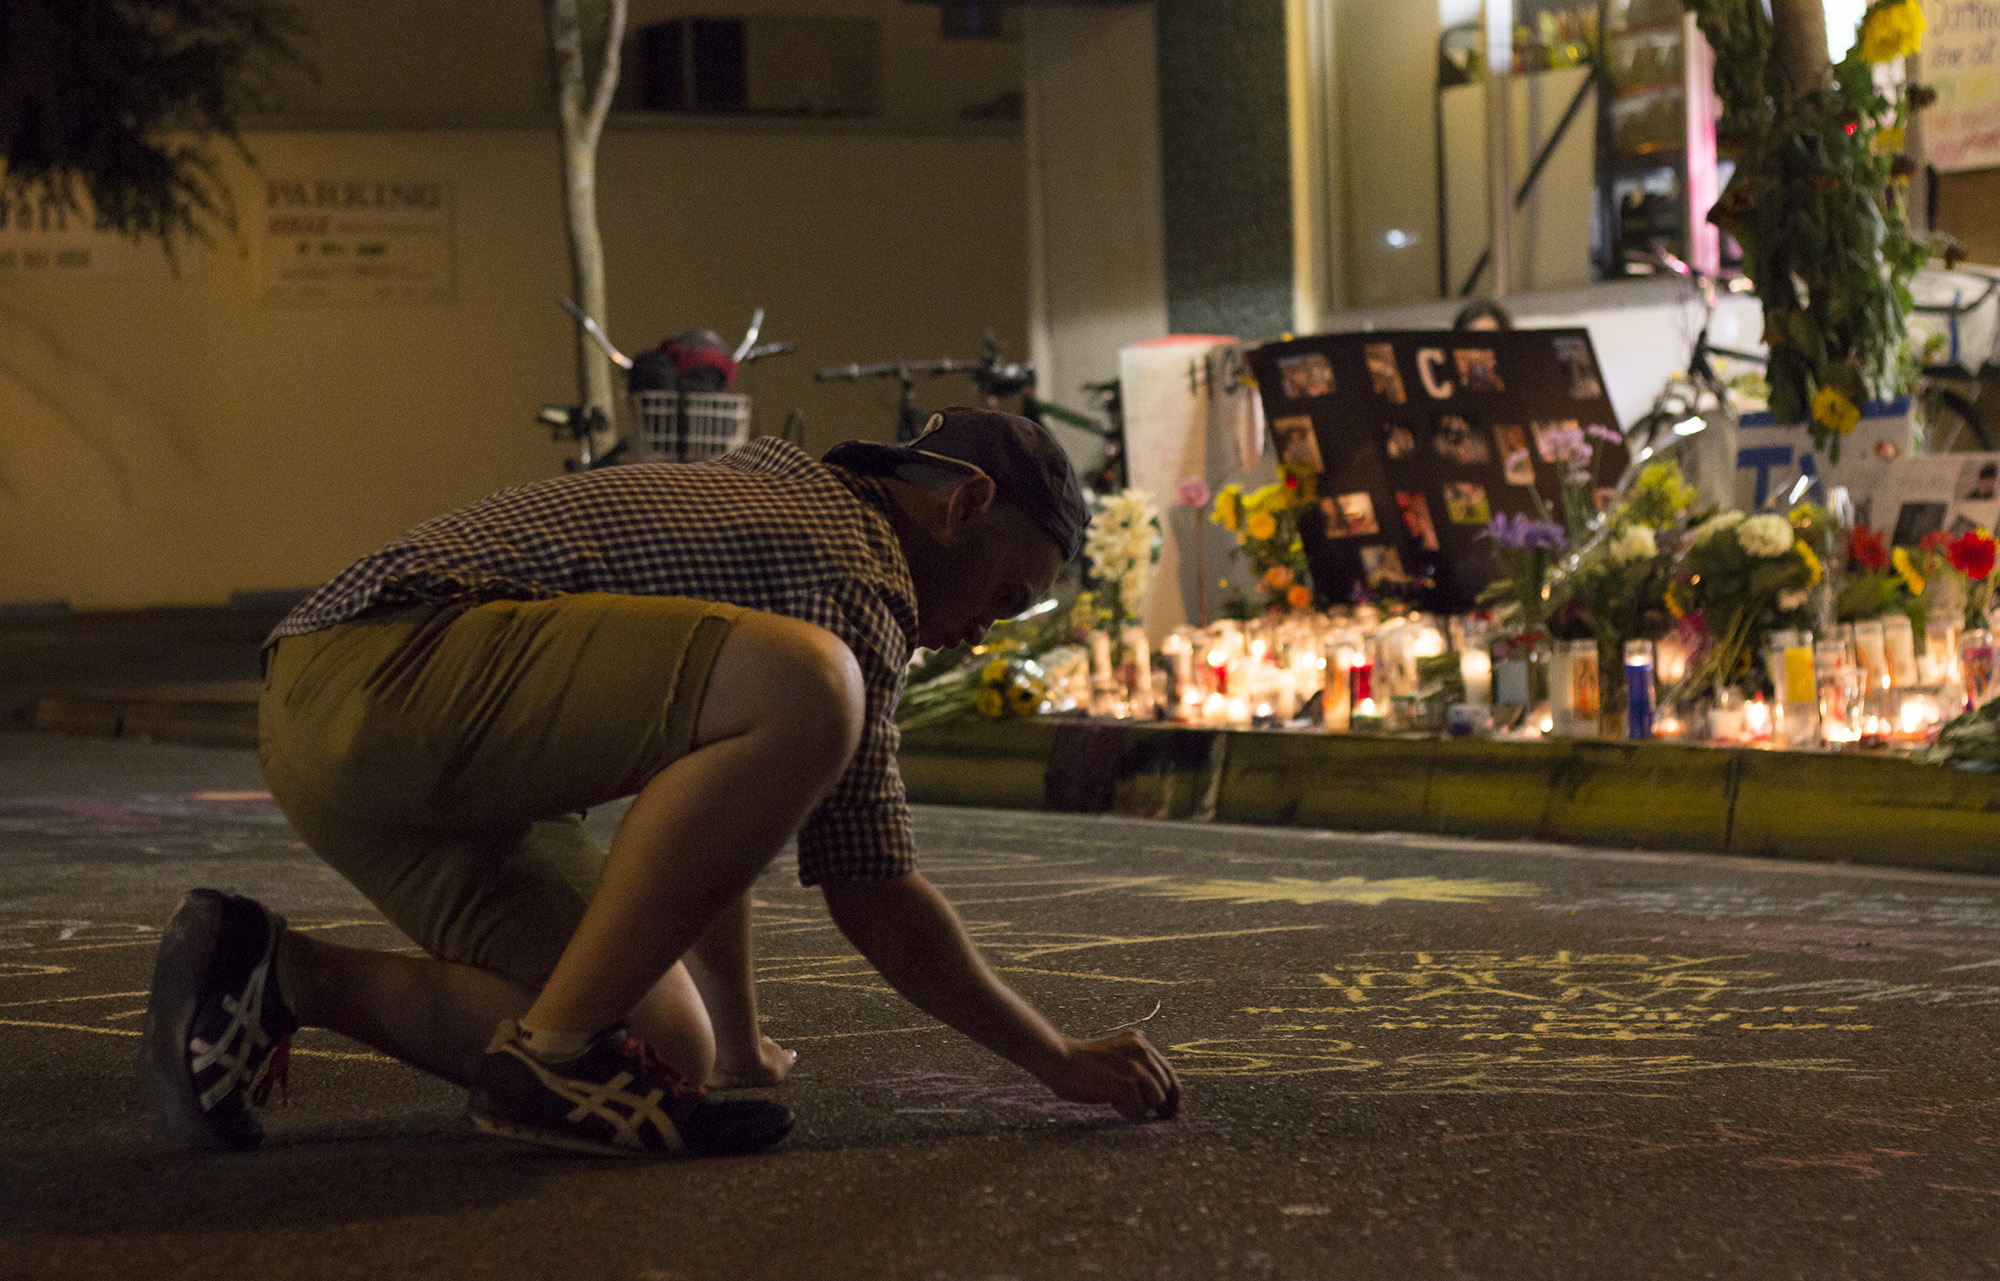 UPDATE: Isla Vista shooter once attended Pierce